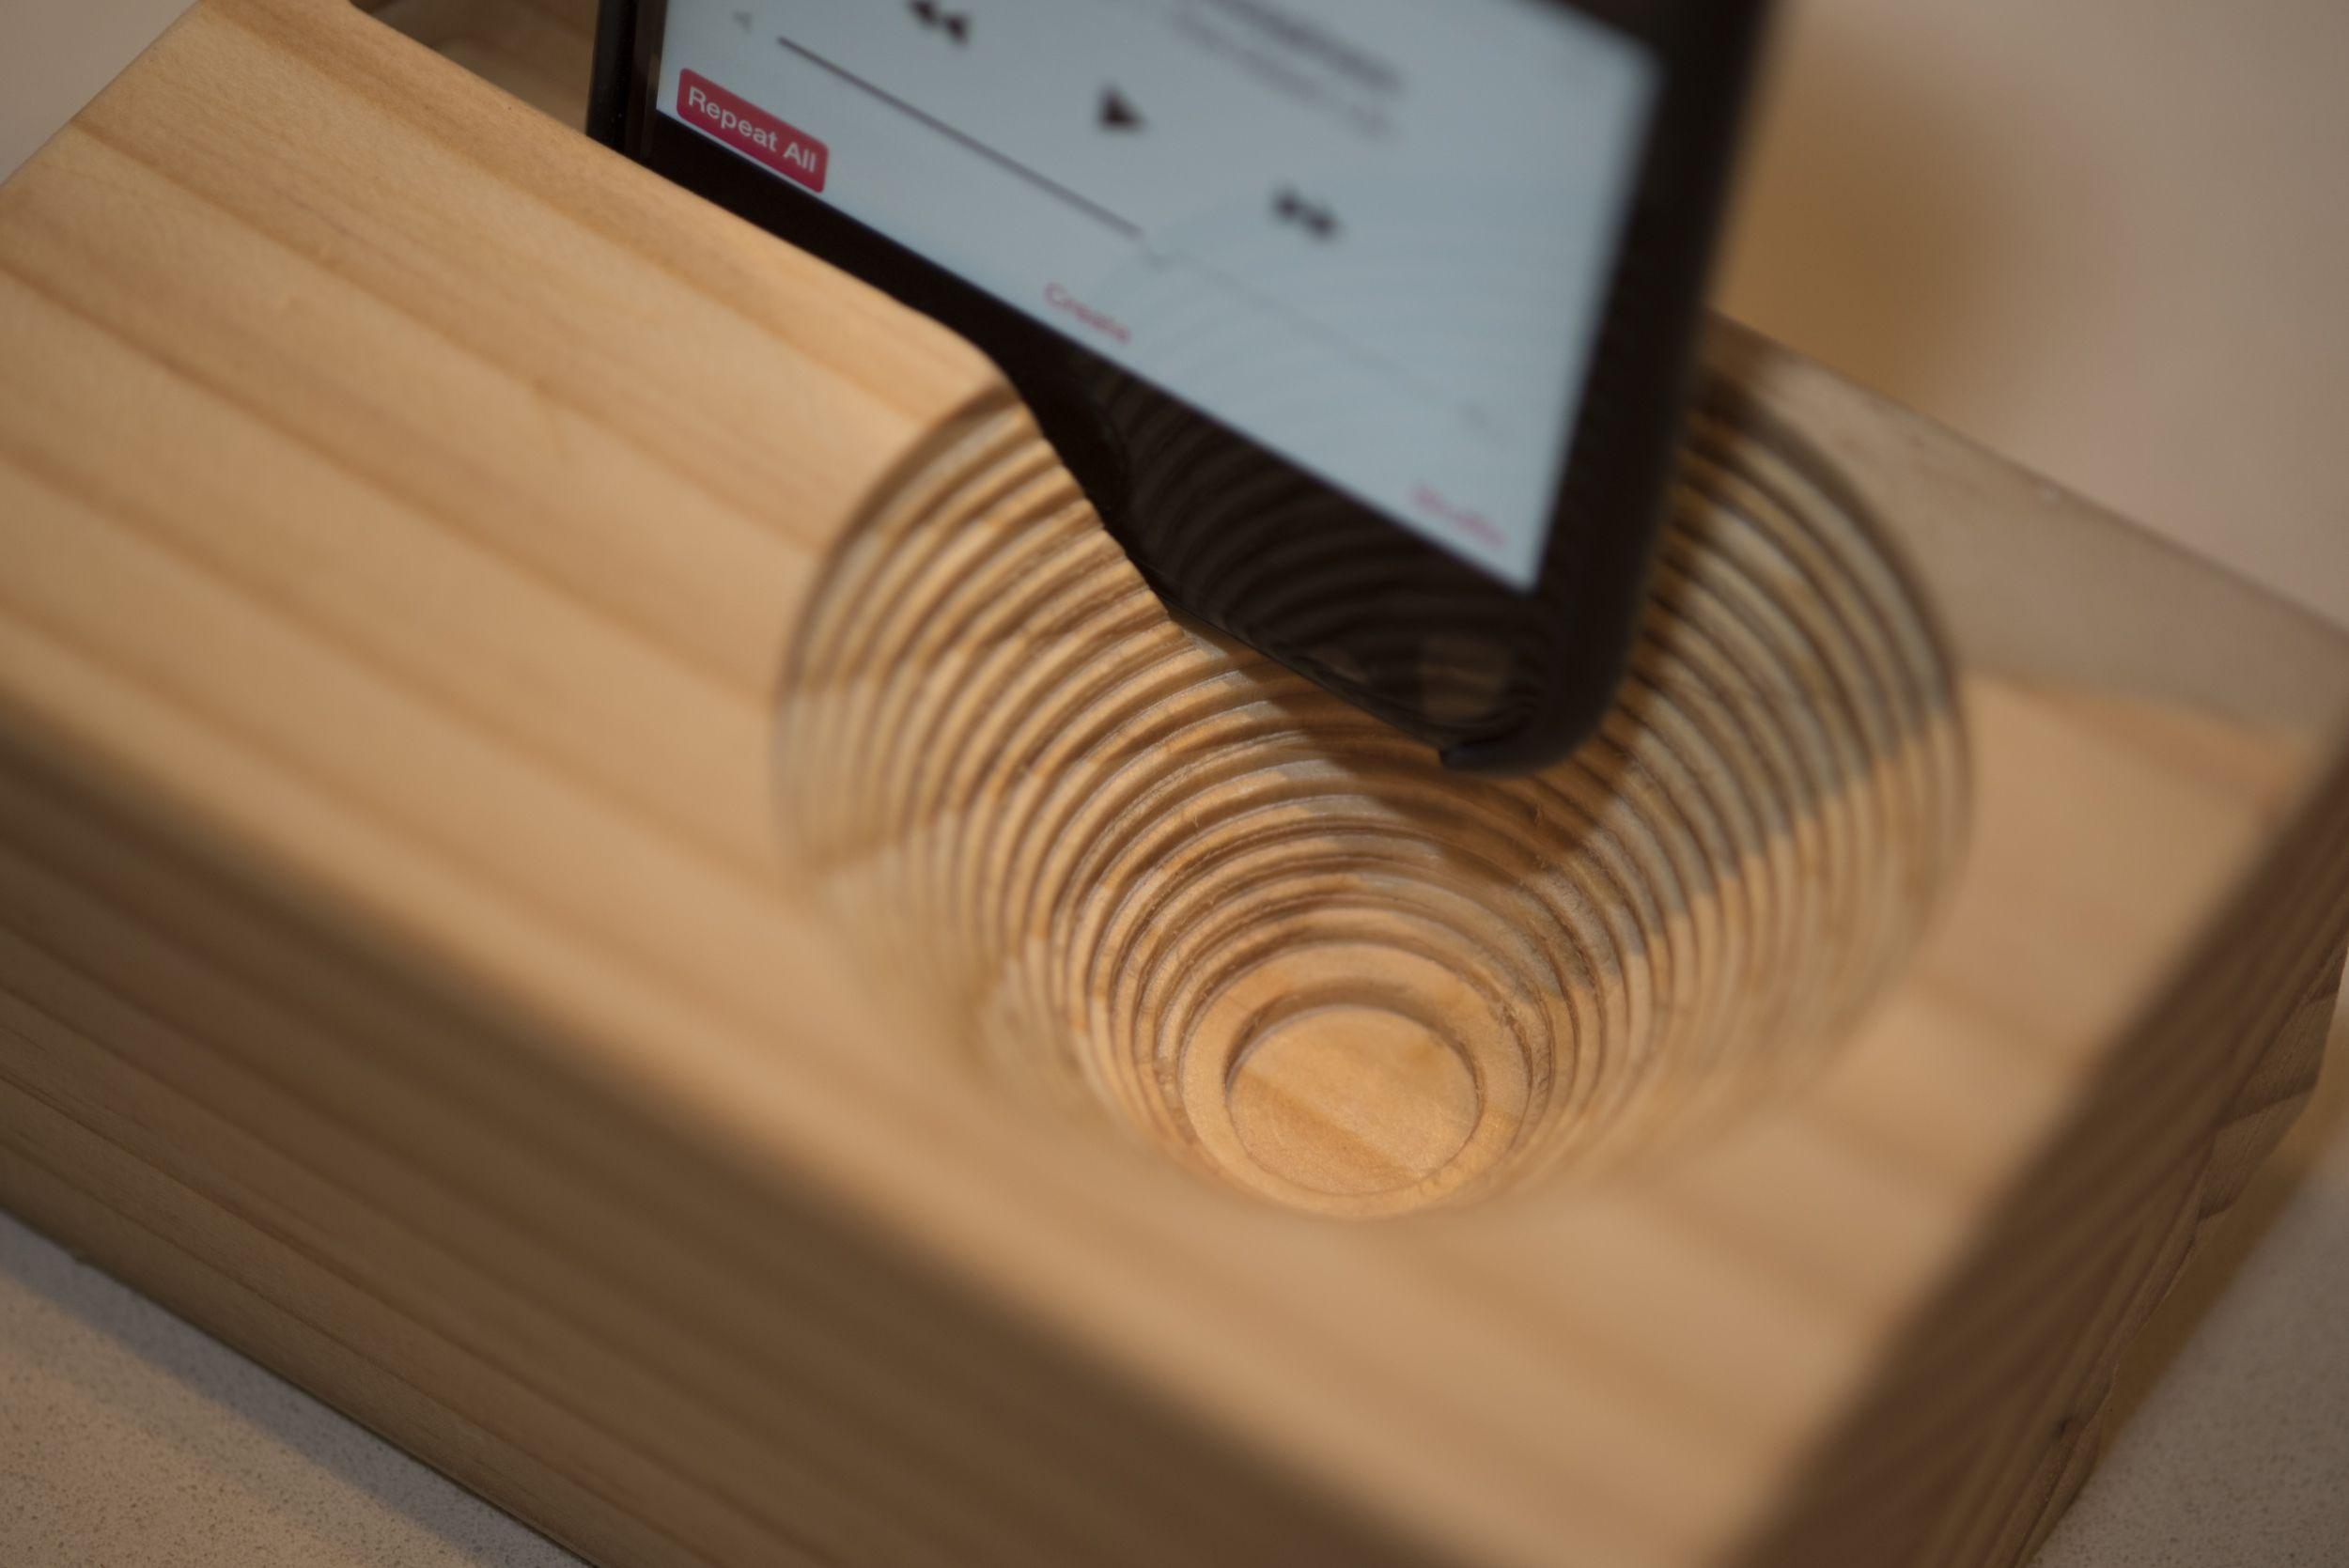 25 Diy Bunk Beds With Plans: X-Carve CNC Project Make A Passive Amplifier For Your